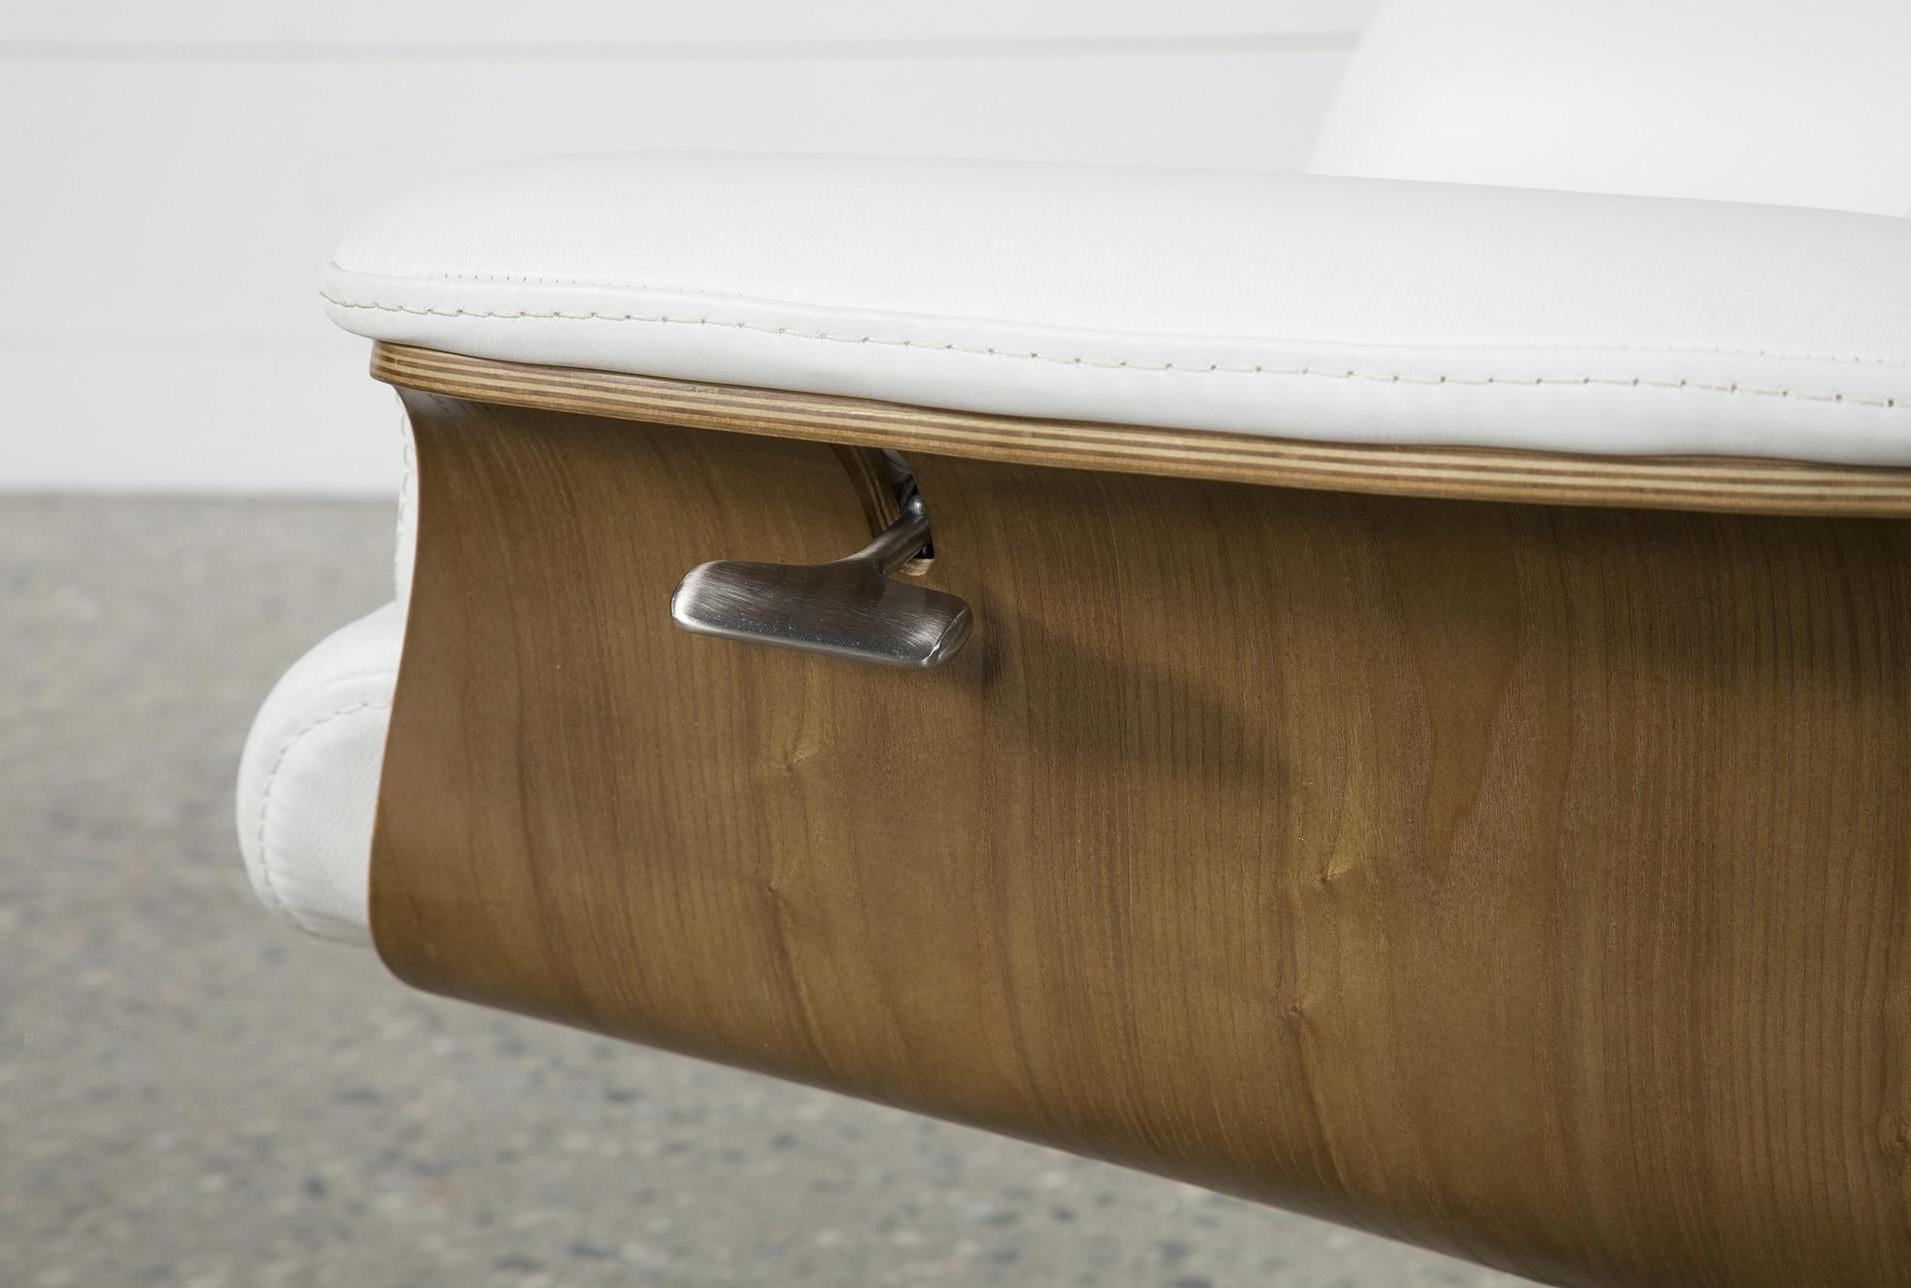 Amala White Leather Reclining Swivel Chairs With Best And Newest Amala White Leather Reclining Swivel Chair #whiteleatherchair (View 8 of 20)